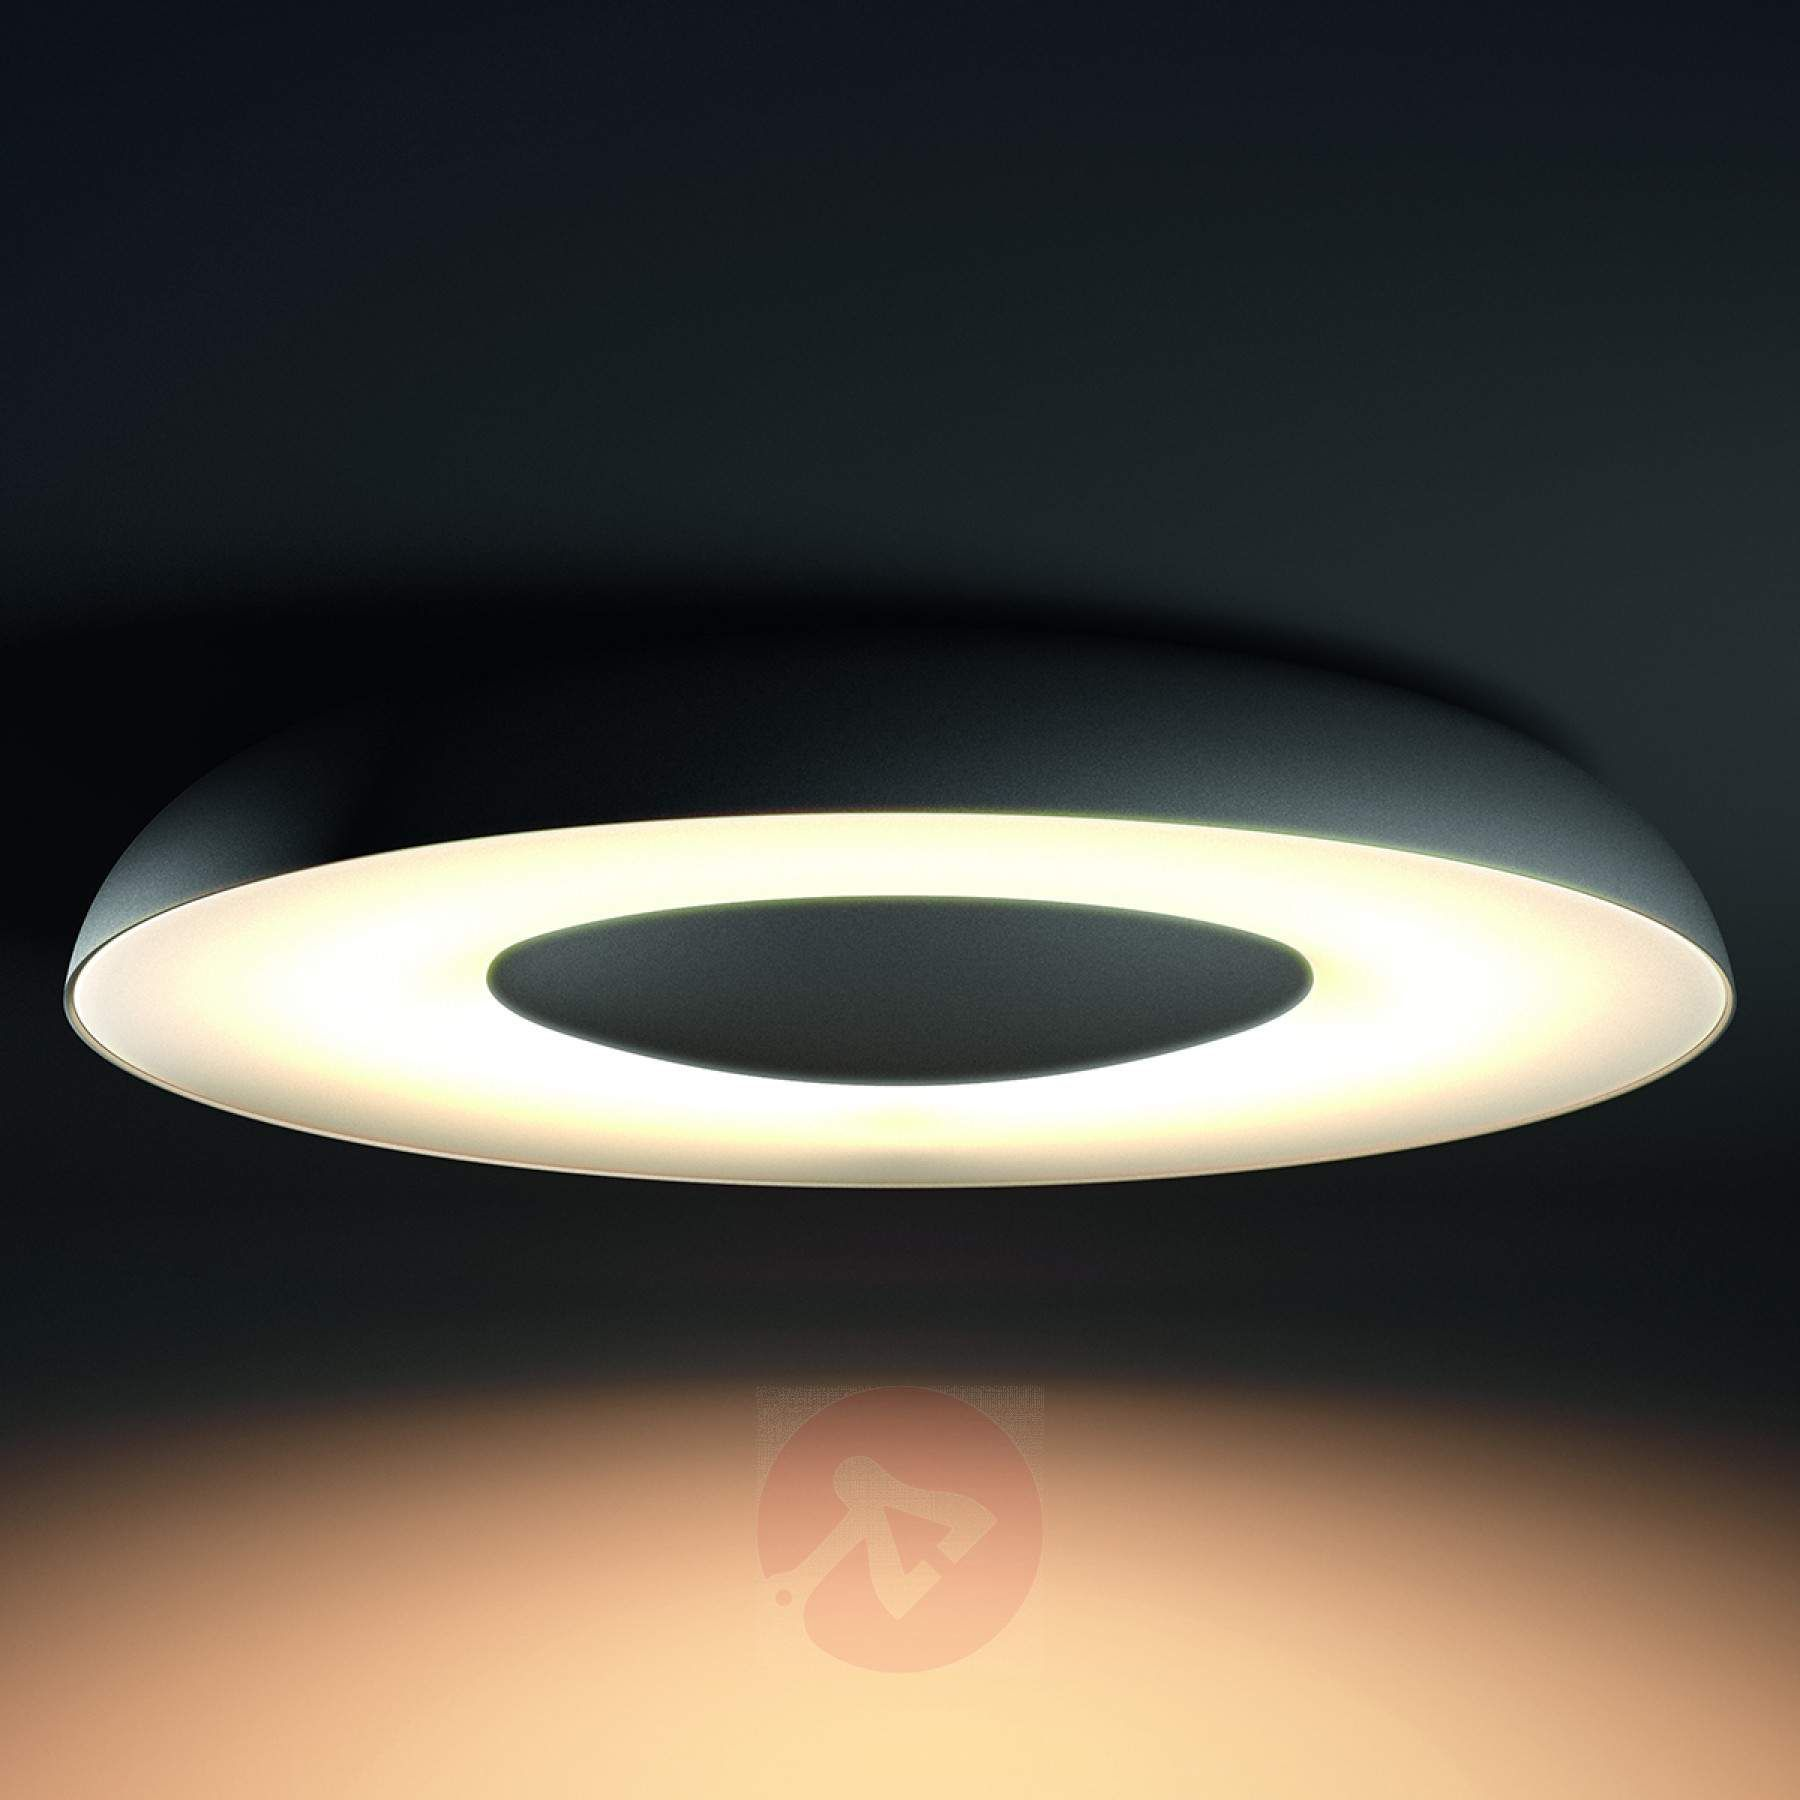 Steuerbare Led Deckenlampe Still Philips Hue 7531868 01 Led Deckenlampen Deckenlampe Lampe